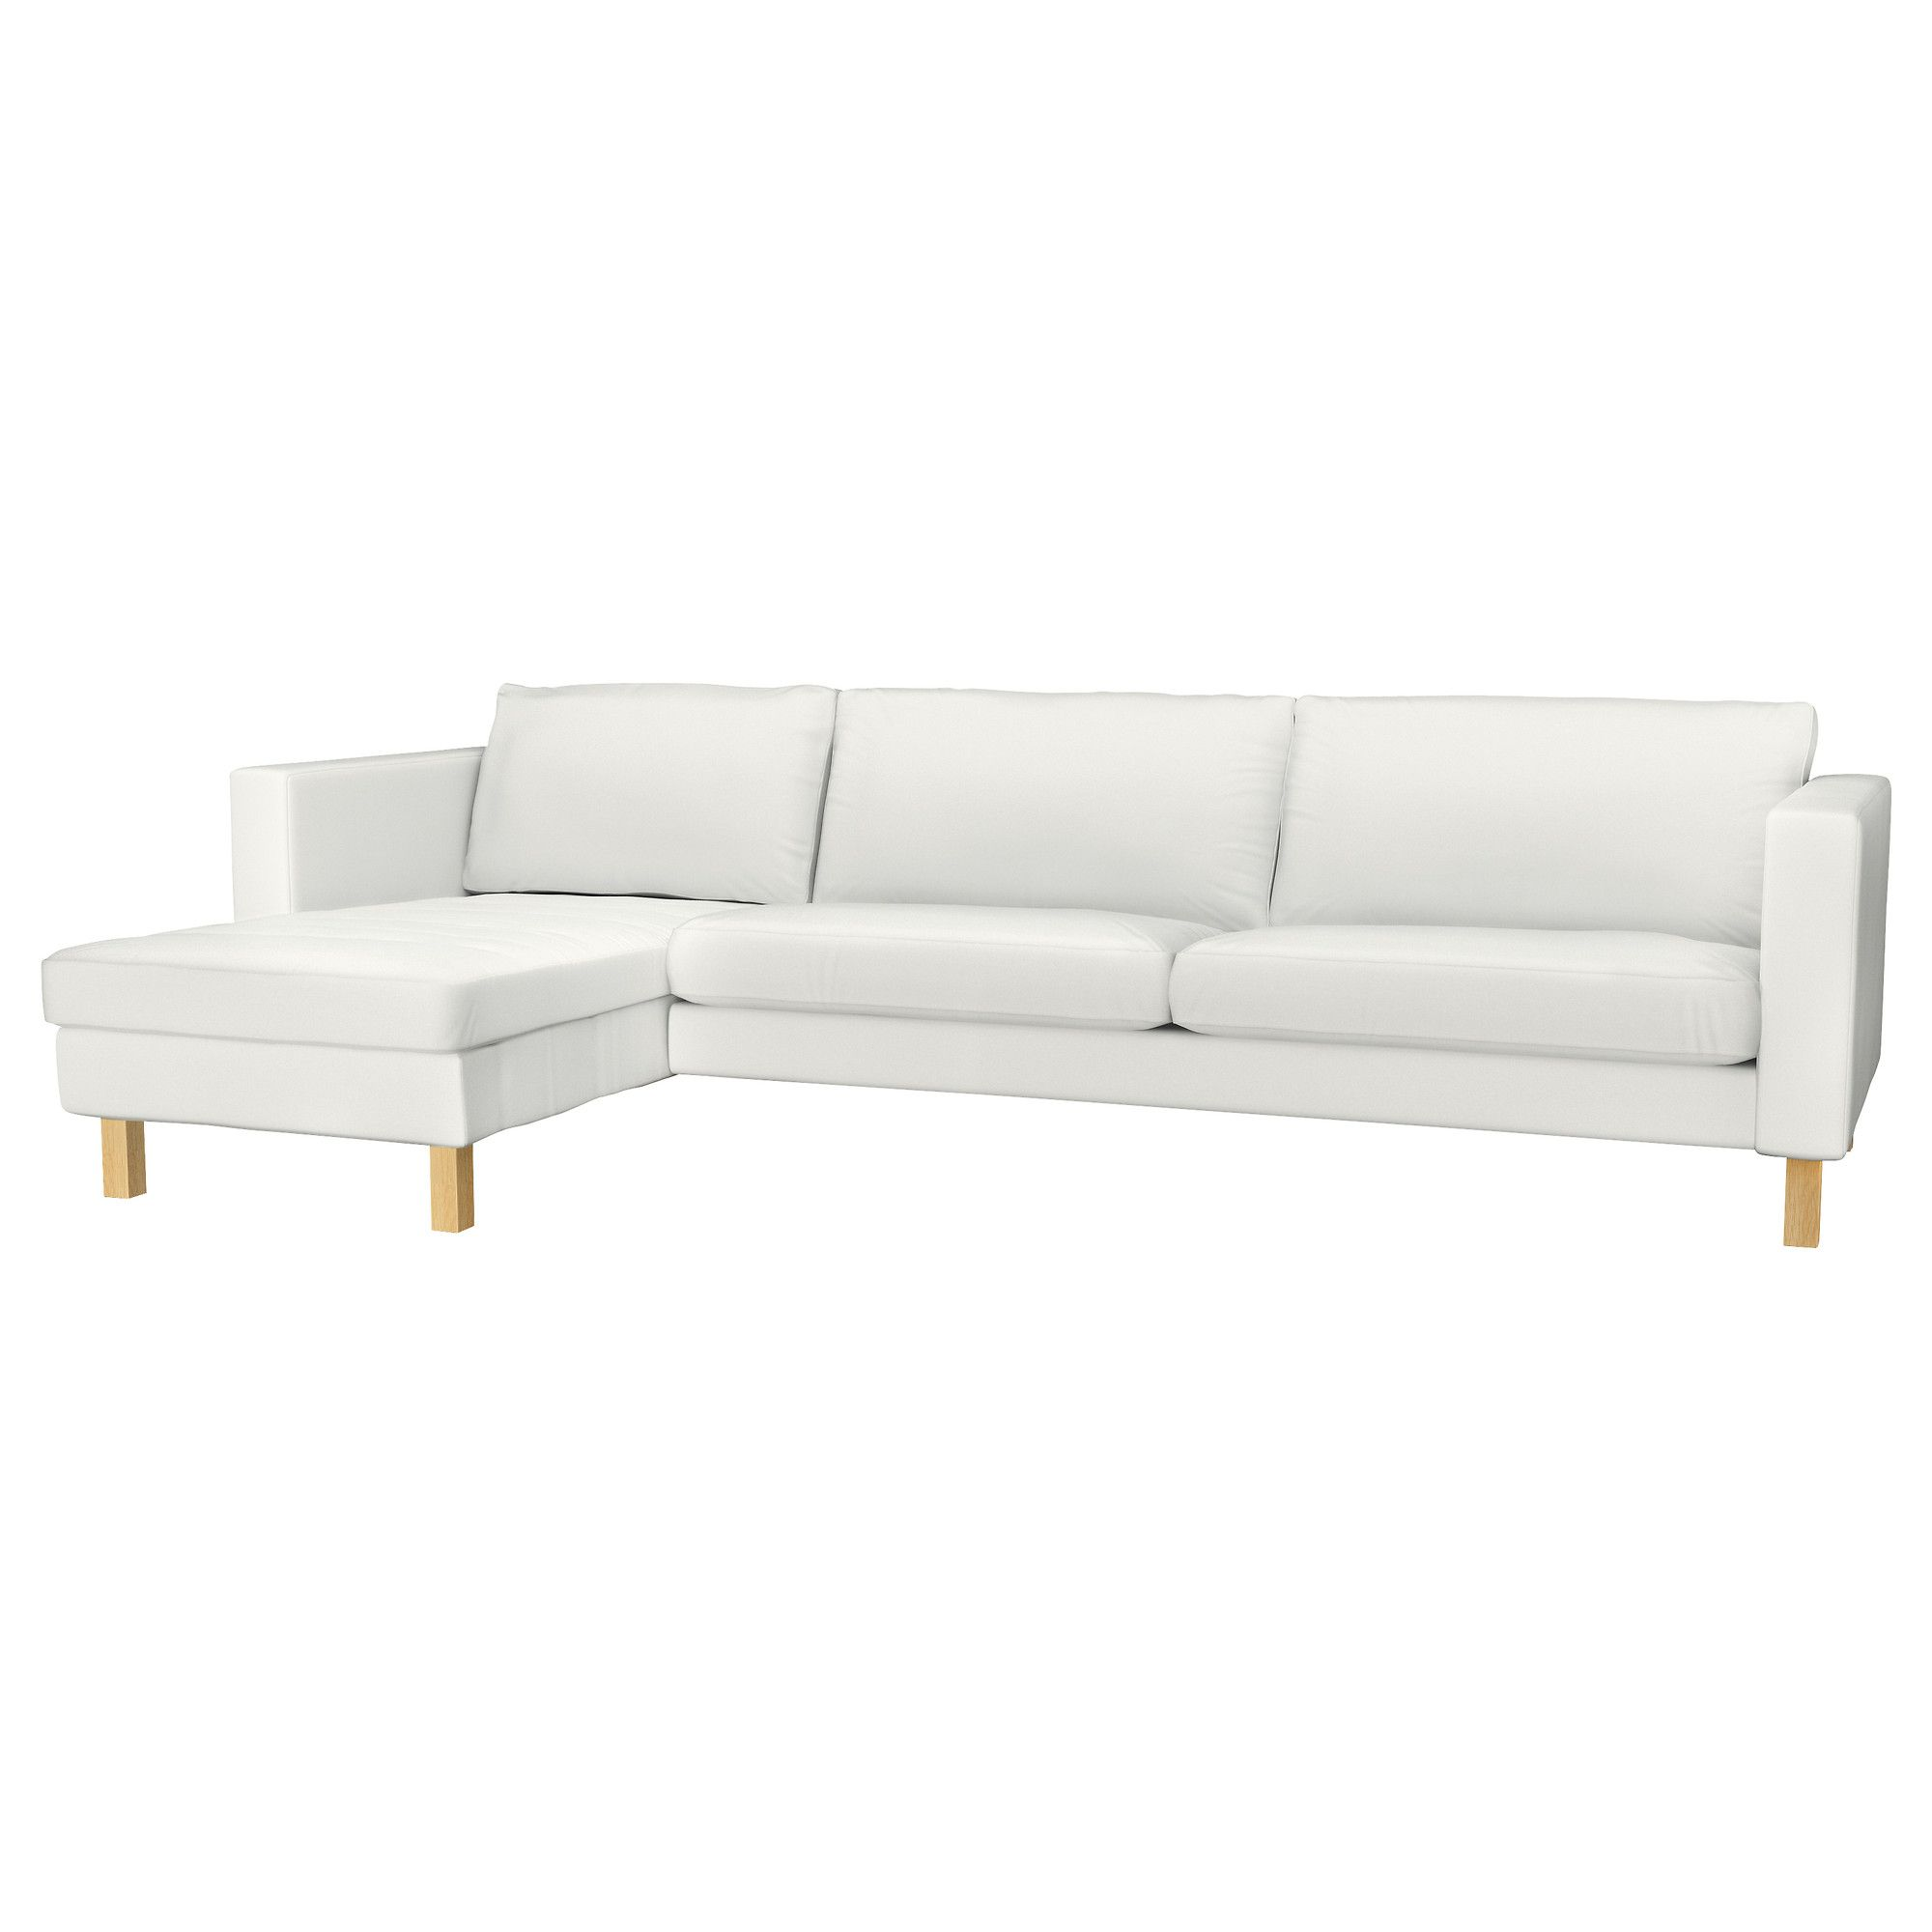 karlstad sofa blekinge white cream full leather chaise sectional and lounge korndal dark gray ikea